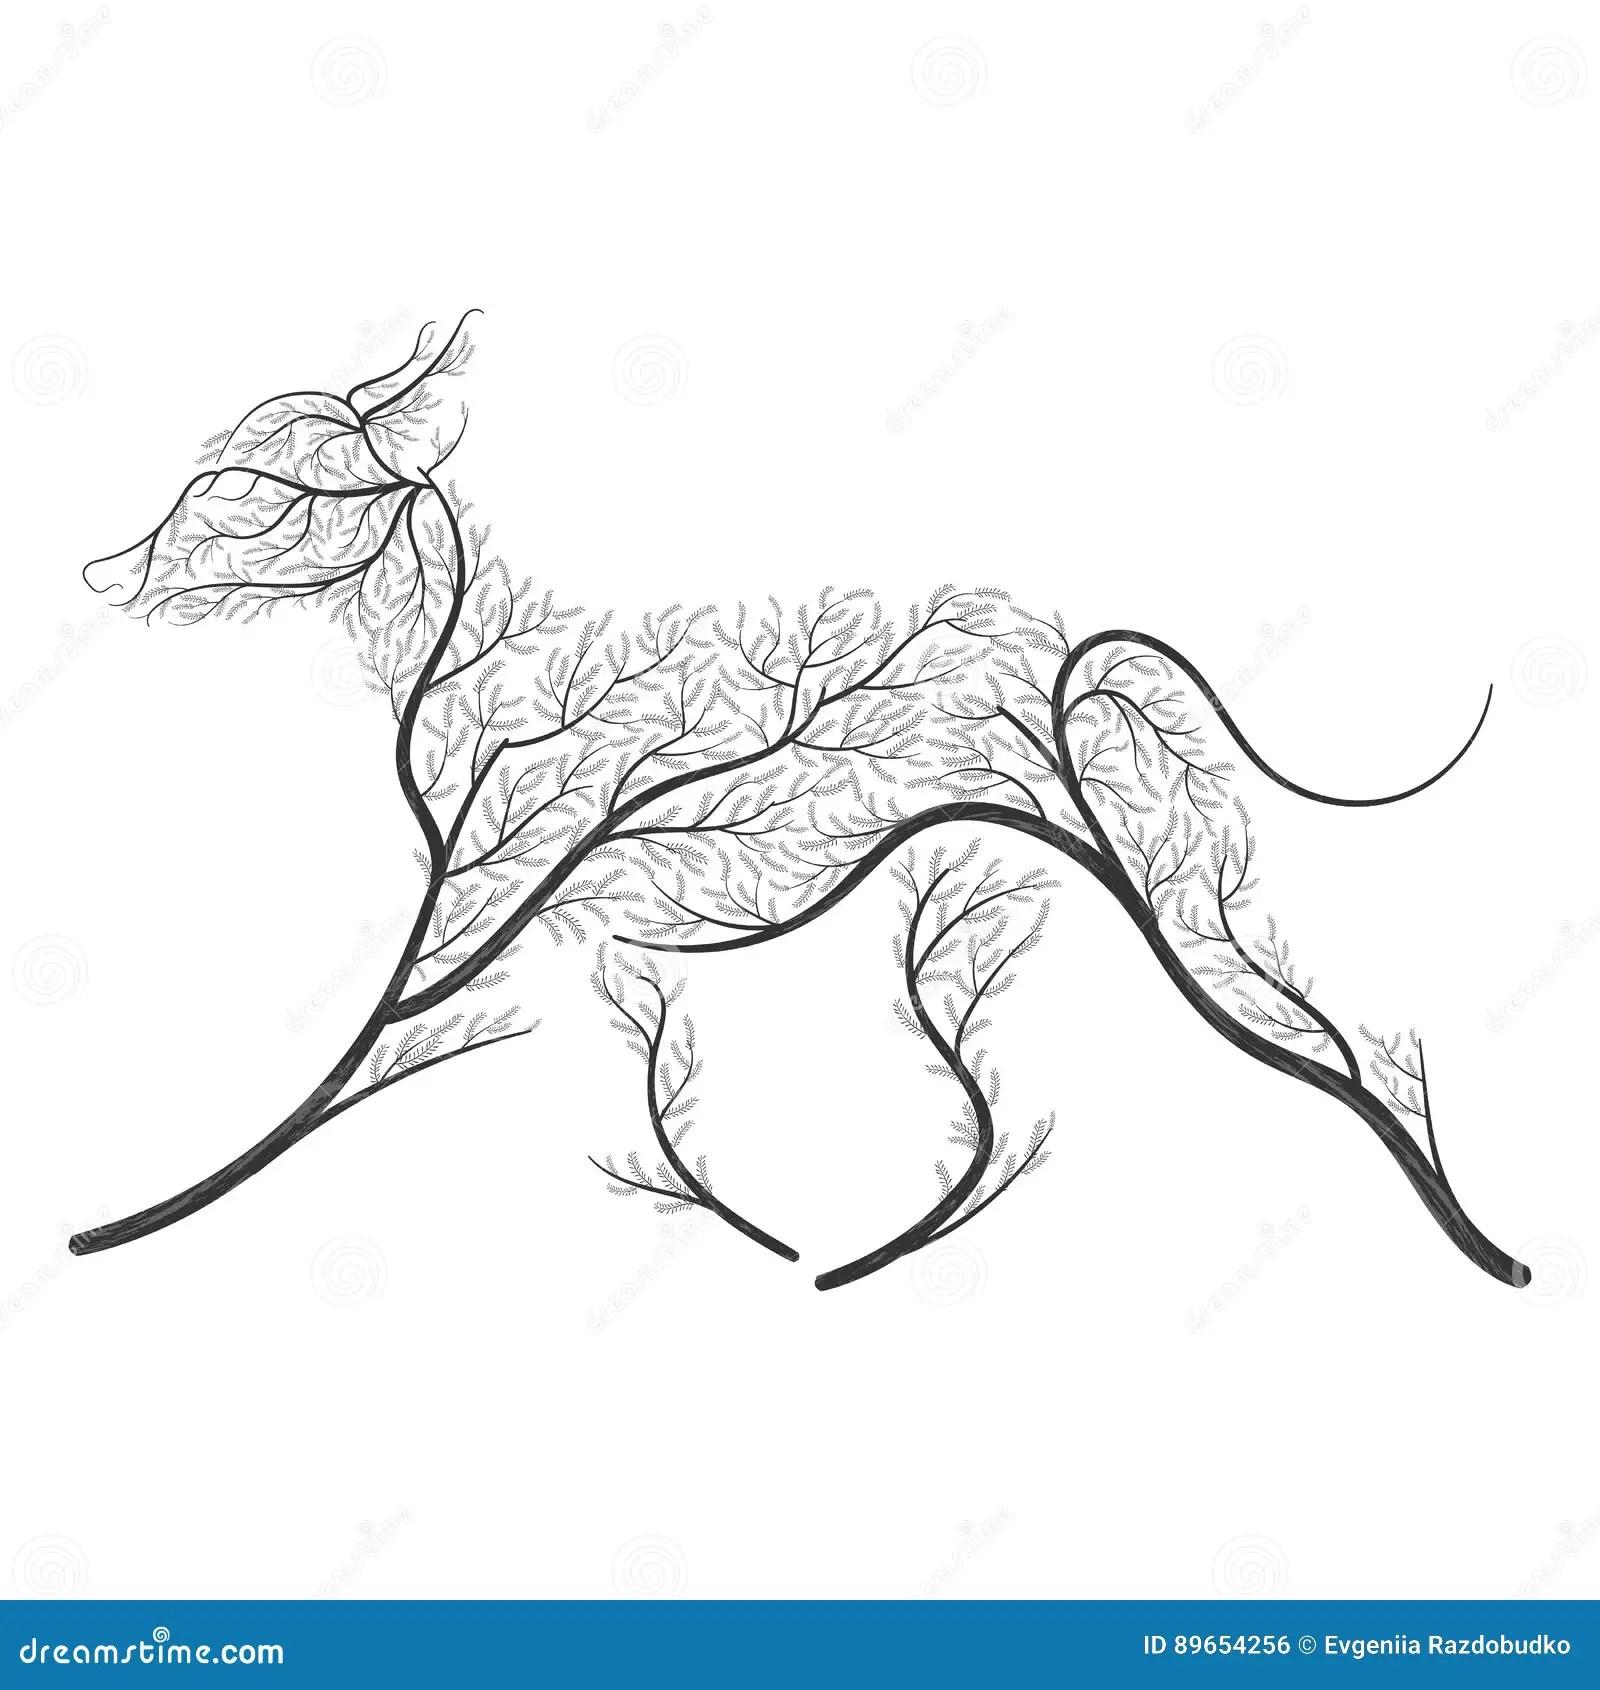 4 Stylized Animals Cartoon Vector